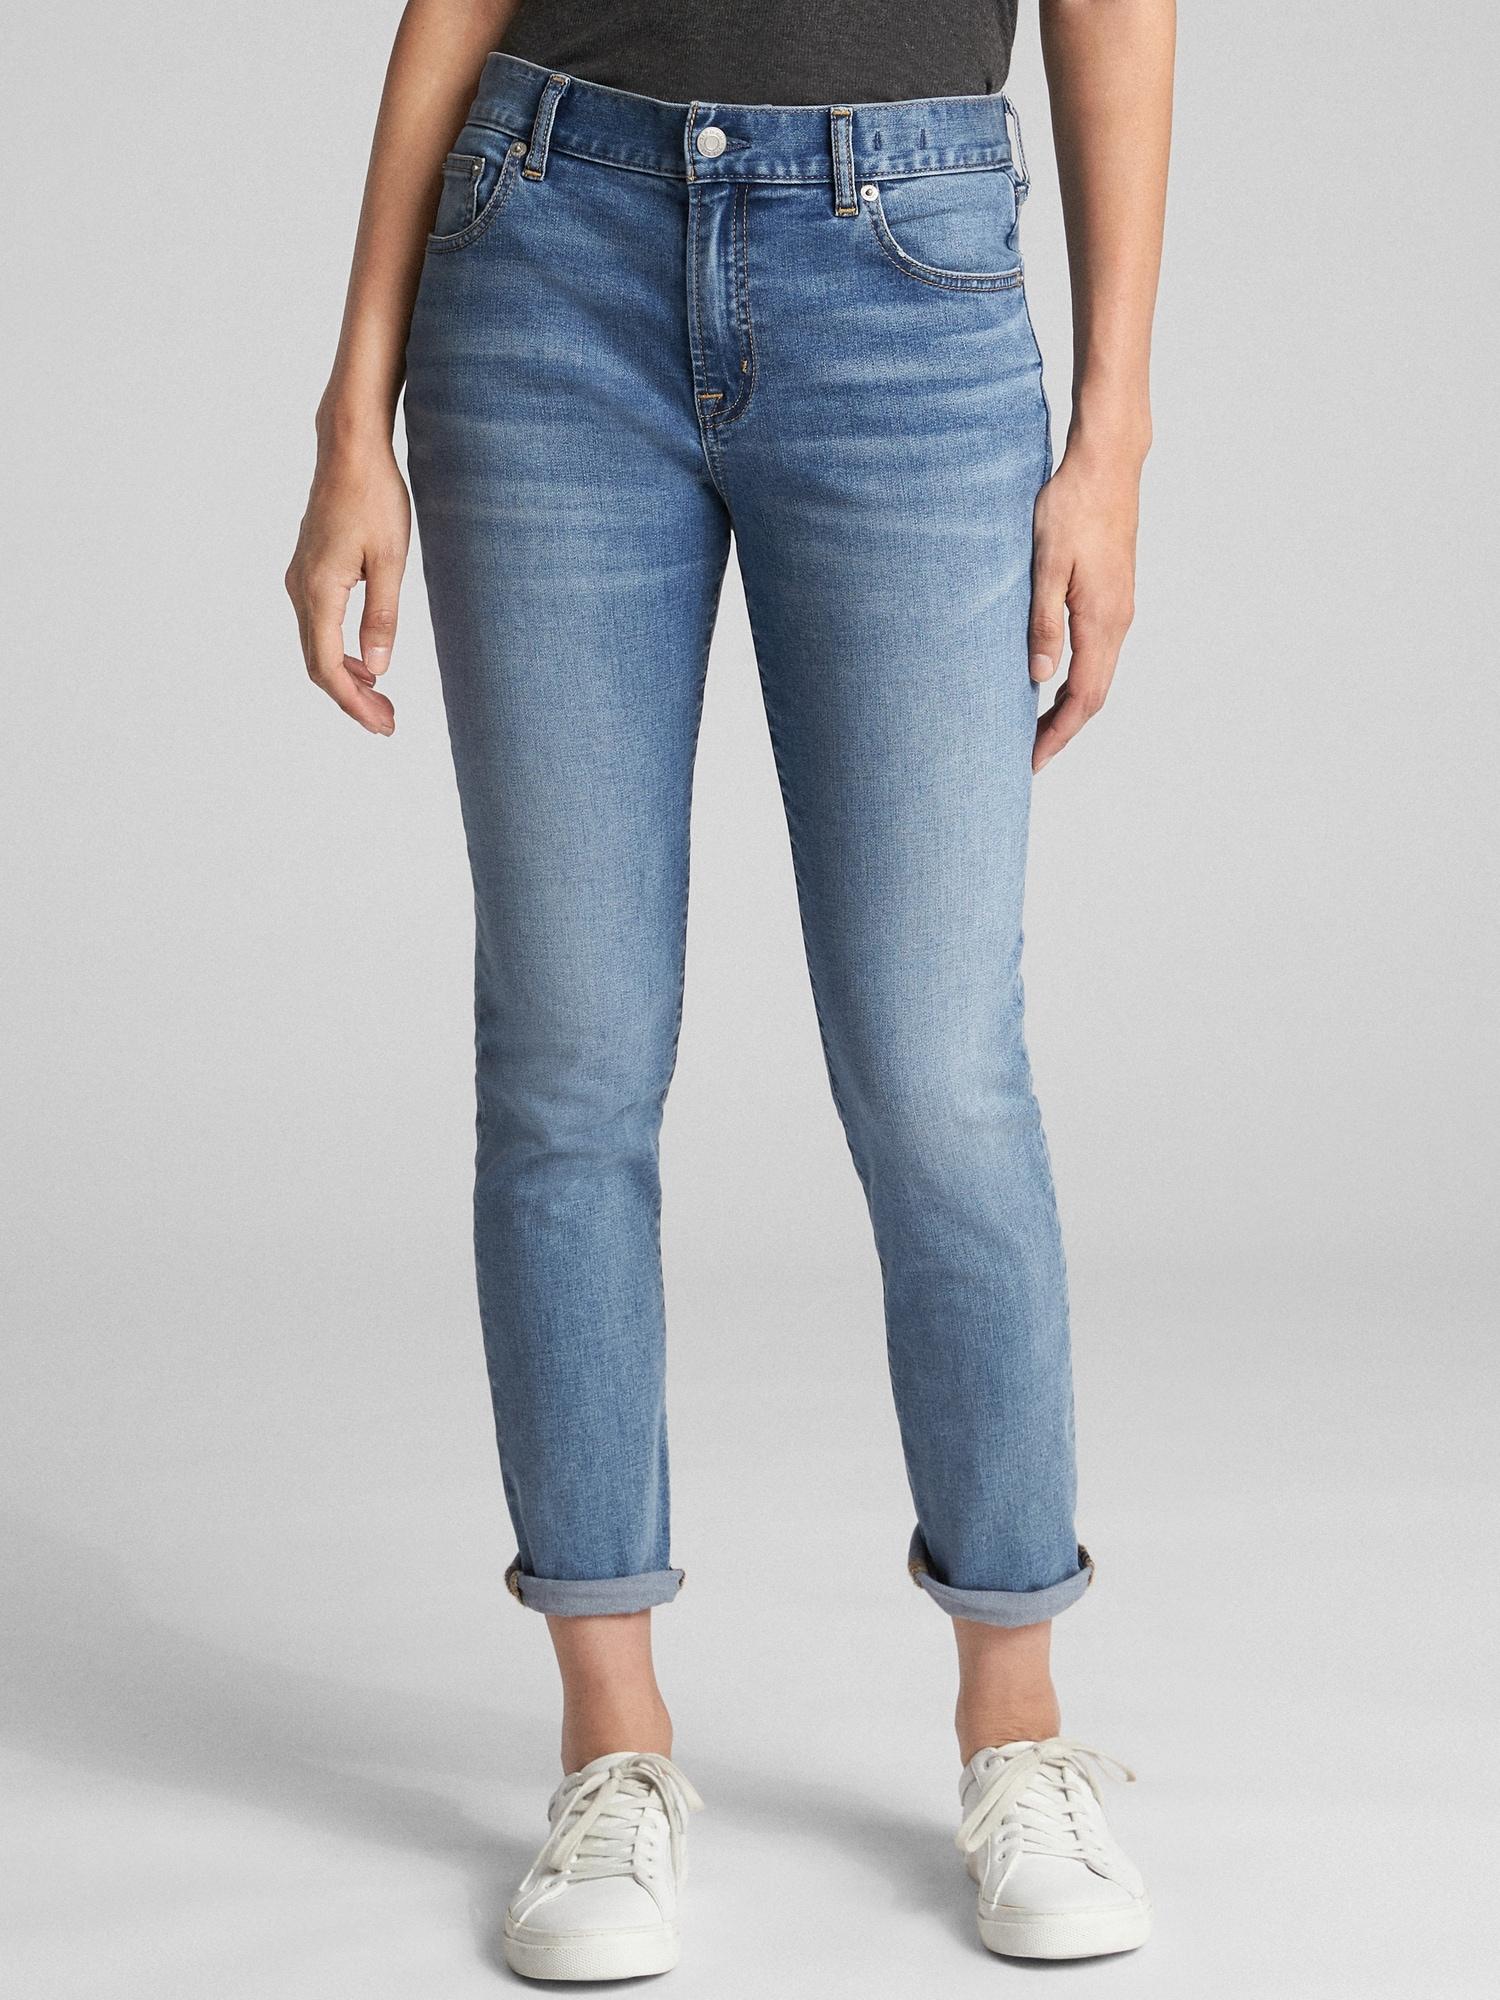 Girlfriend jeans vs boyfriend jeans, girlfriend jeans fit